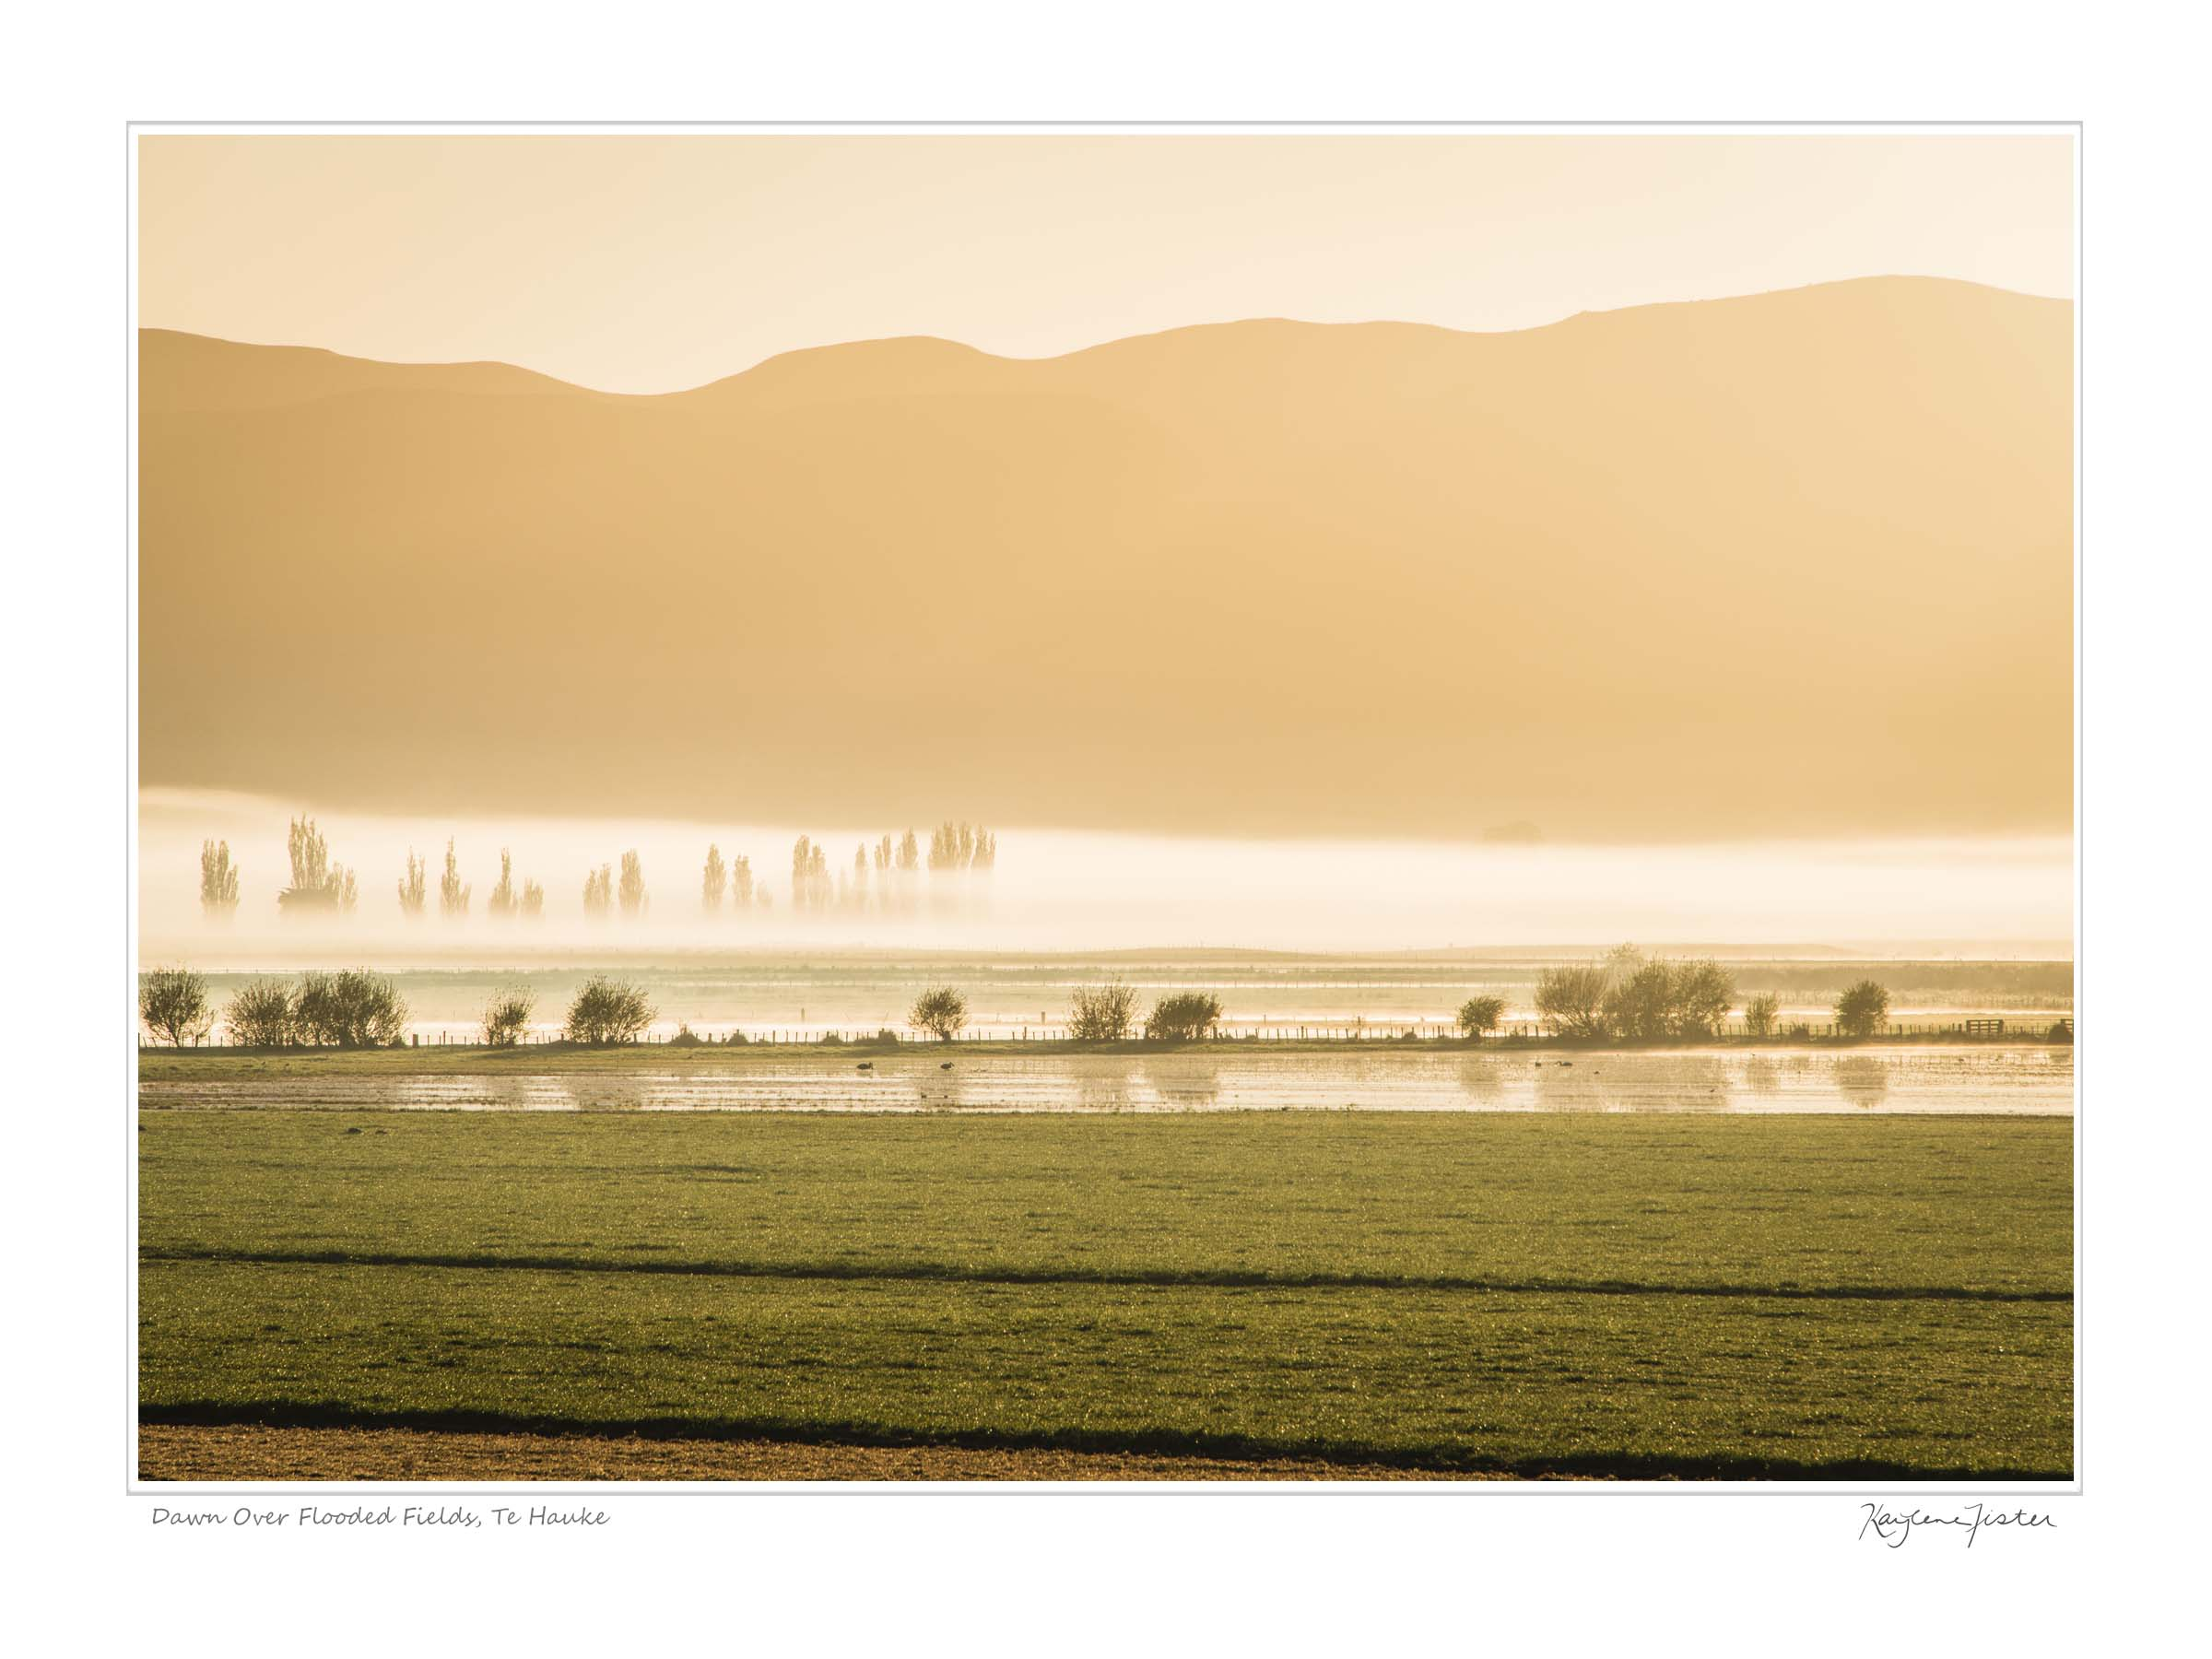 0061:4394 Dawn Over Flooded Fields, Te Hauke